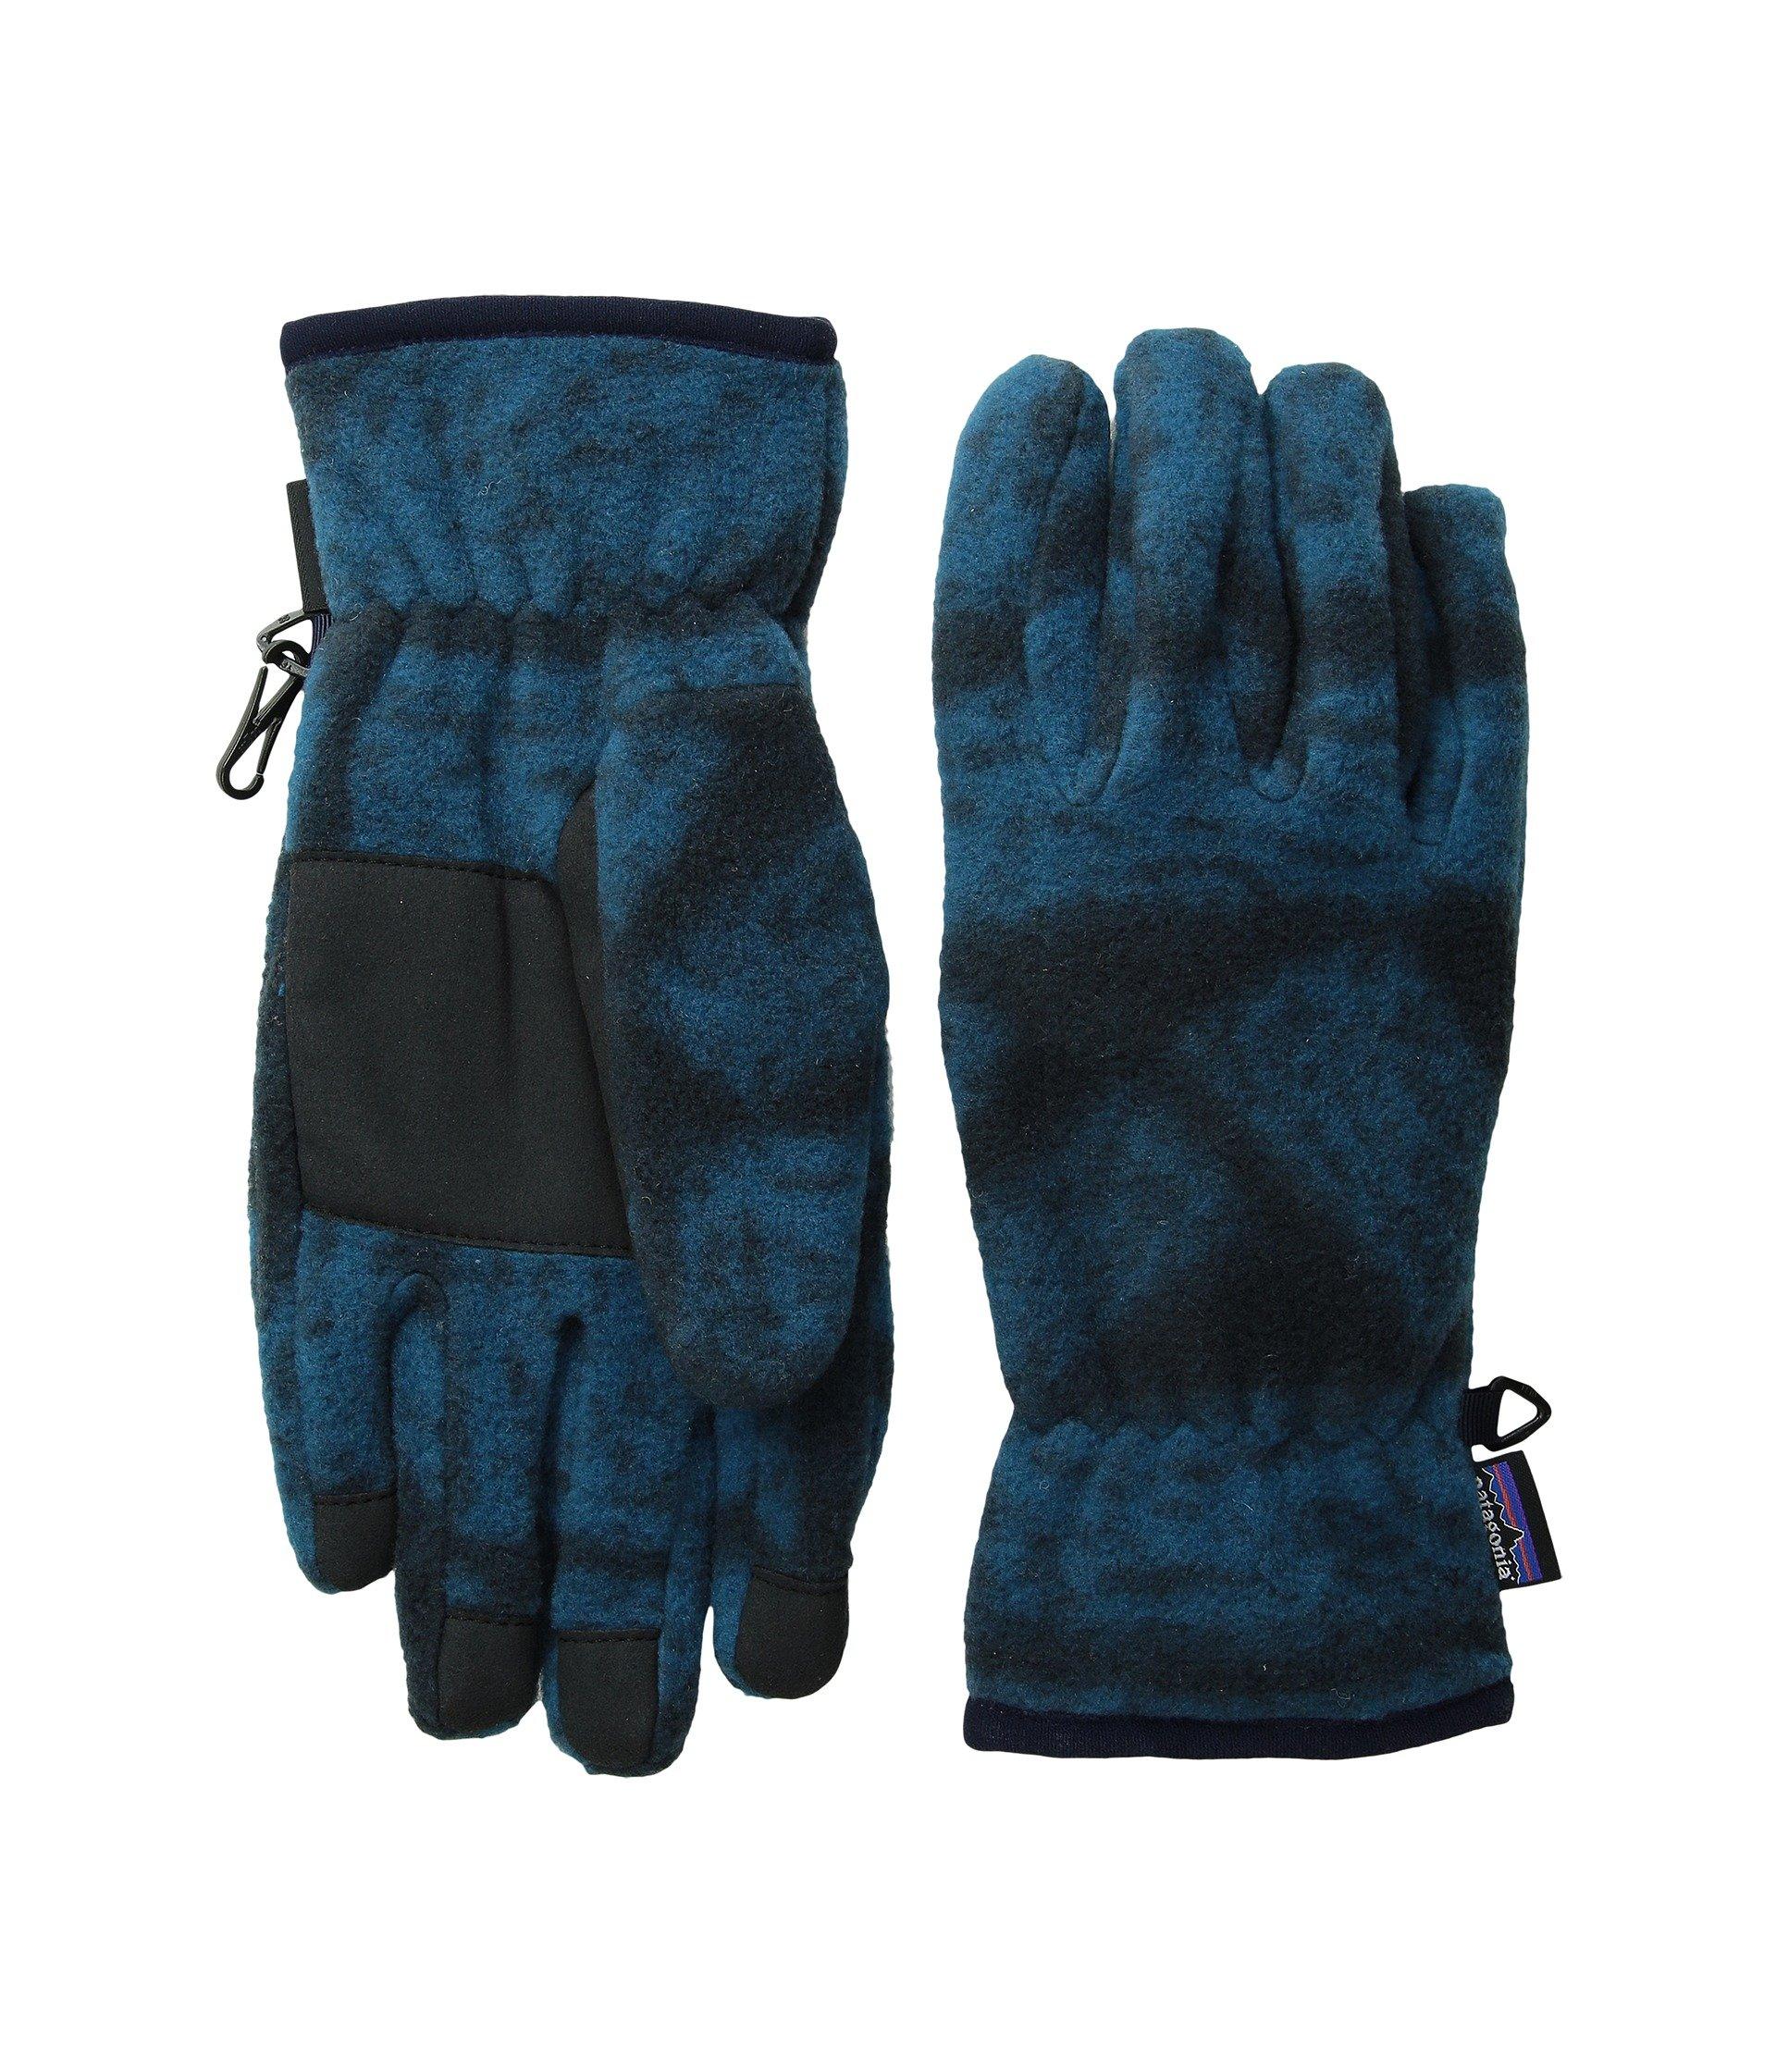 Guantes para Hombre Patagonia Synch Gloves  + Patagonia en VeoyCompro.net